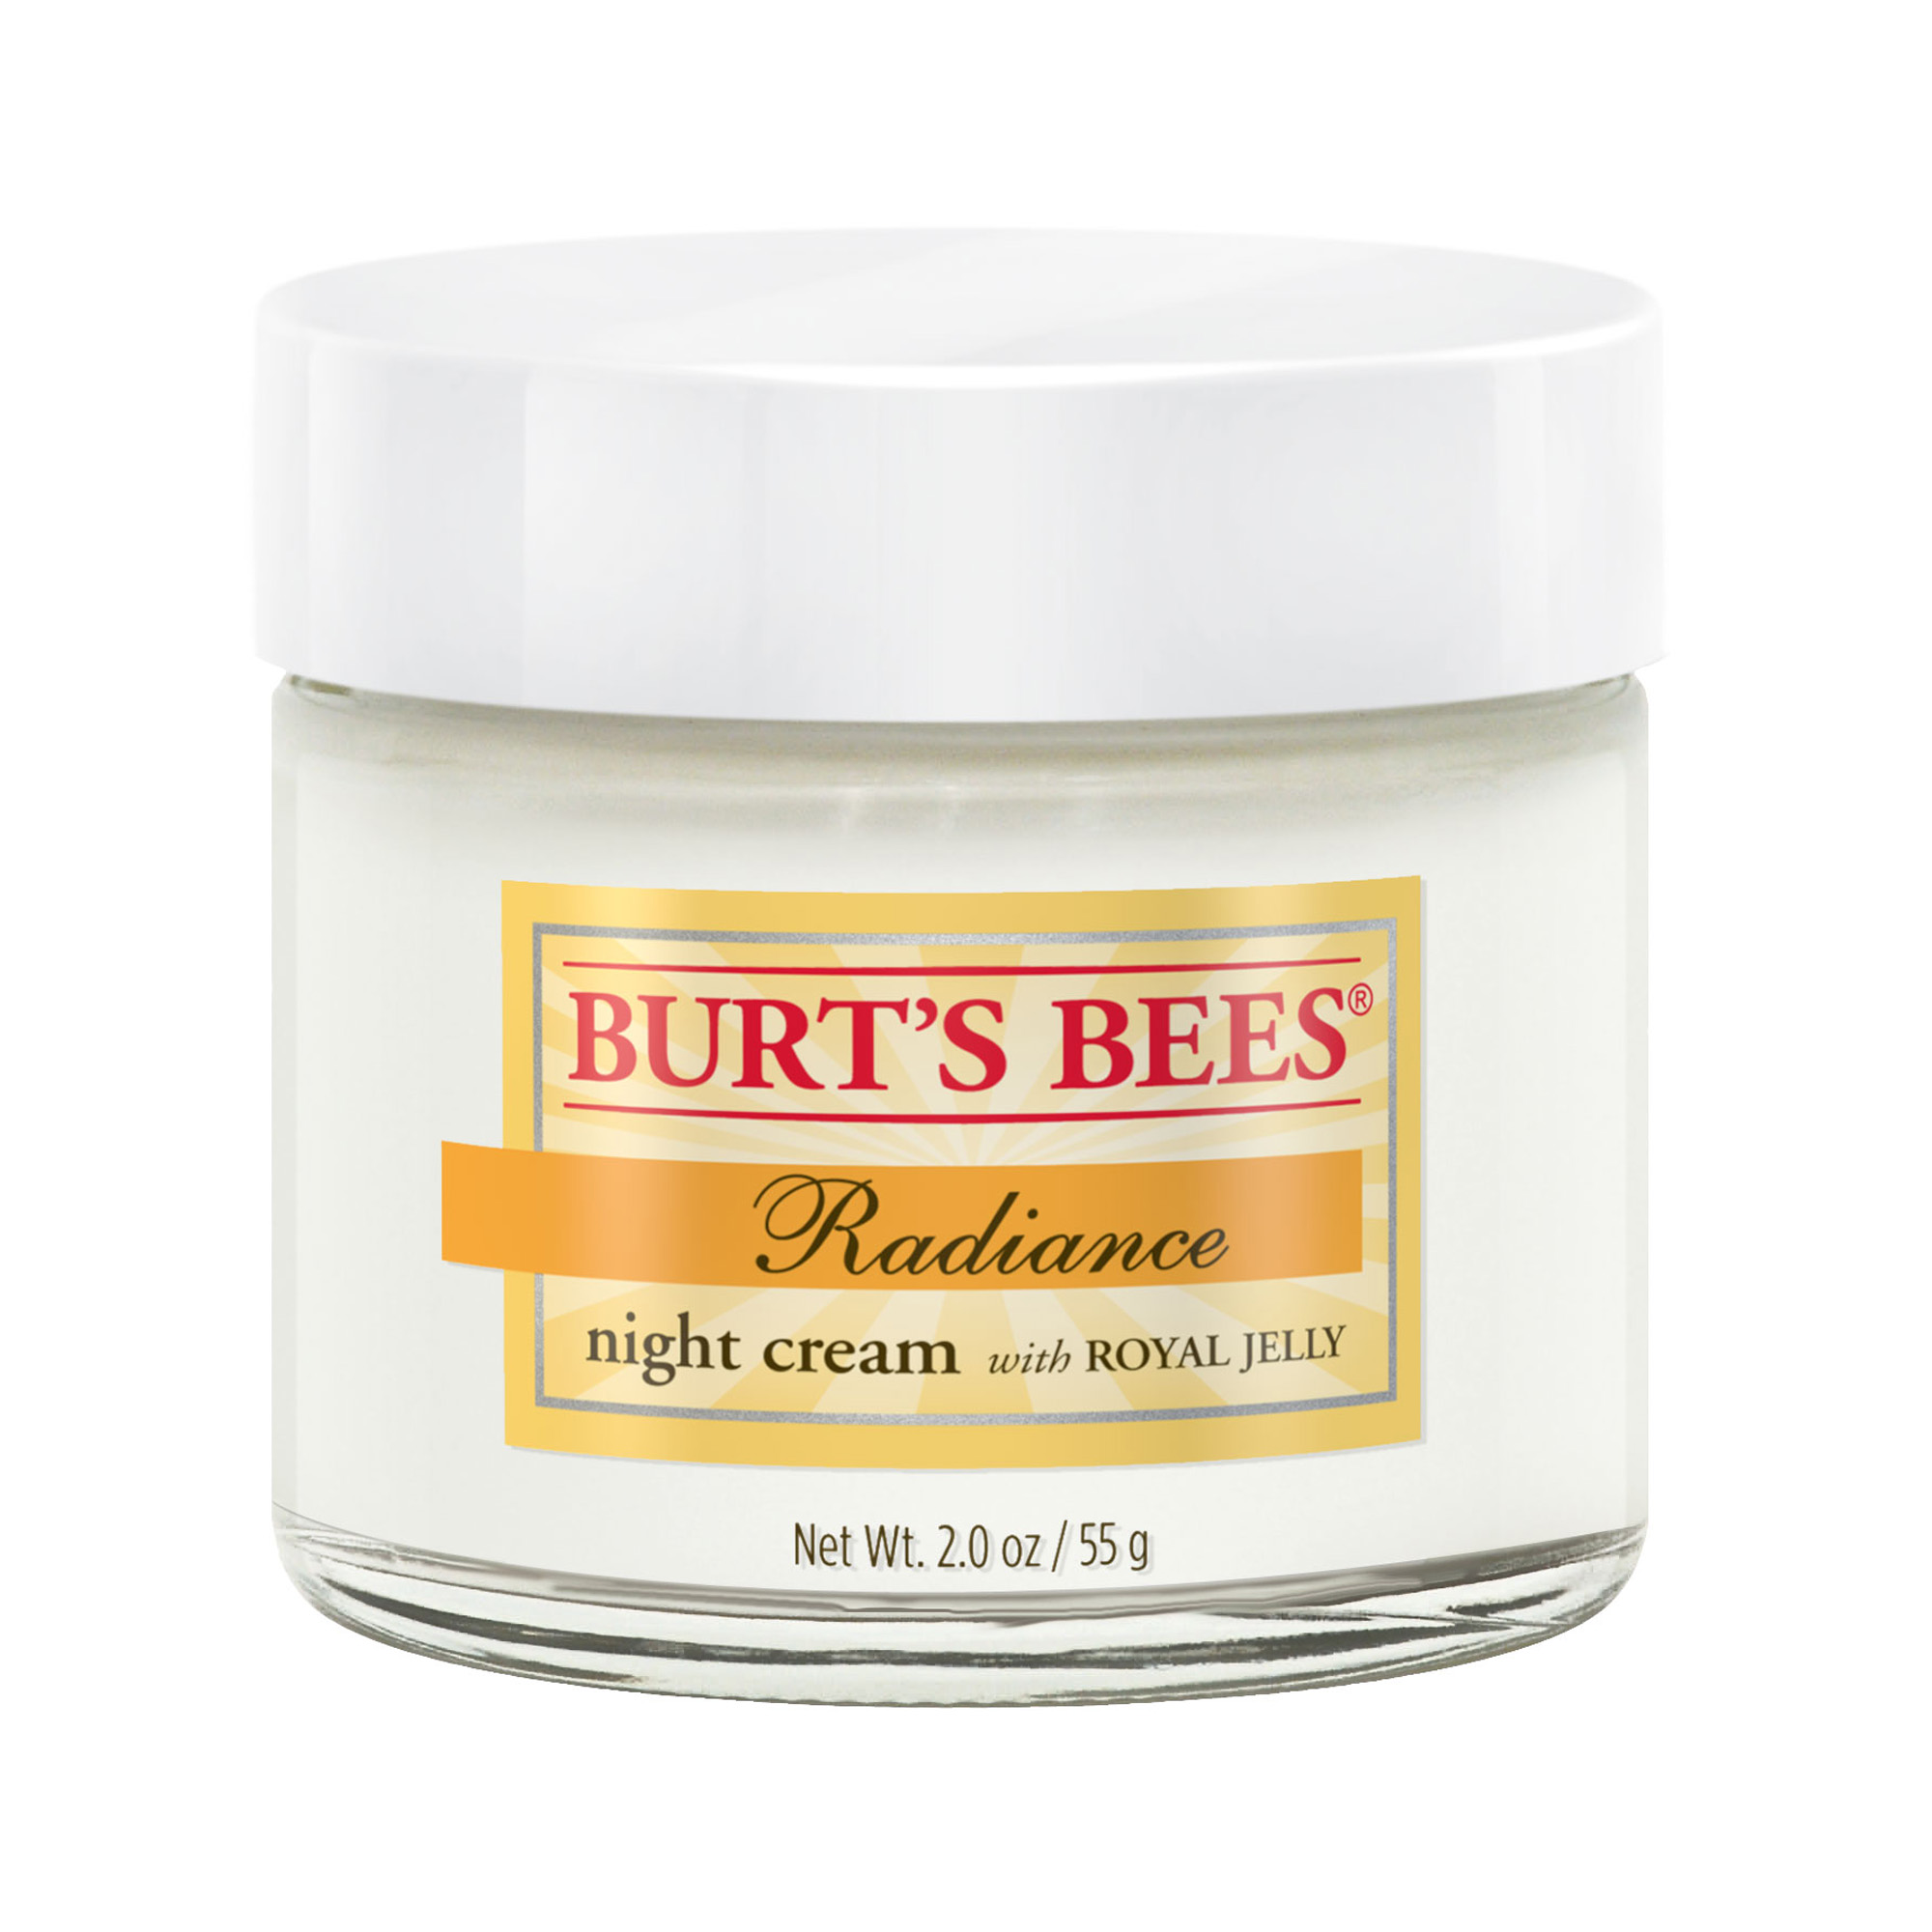 Herbal hibiscus tea 55g dr bean australia - Burt S Bees Radiance Night Cream 55g